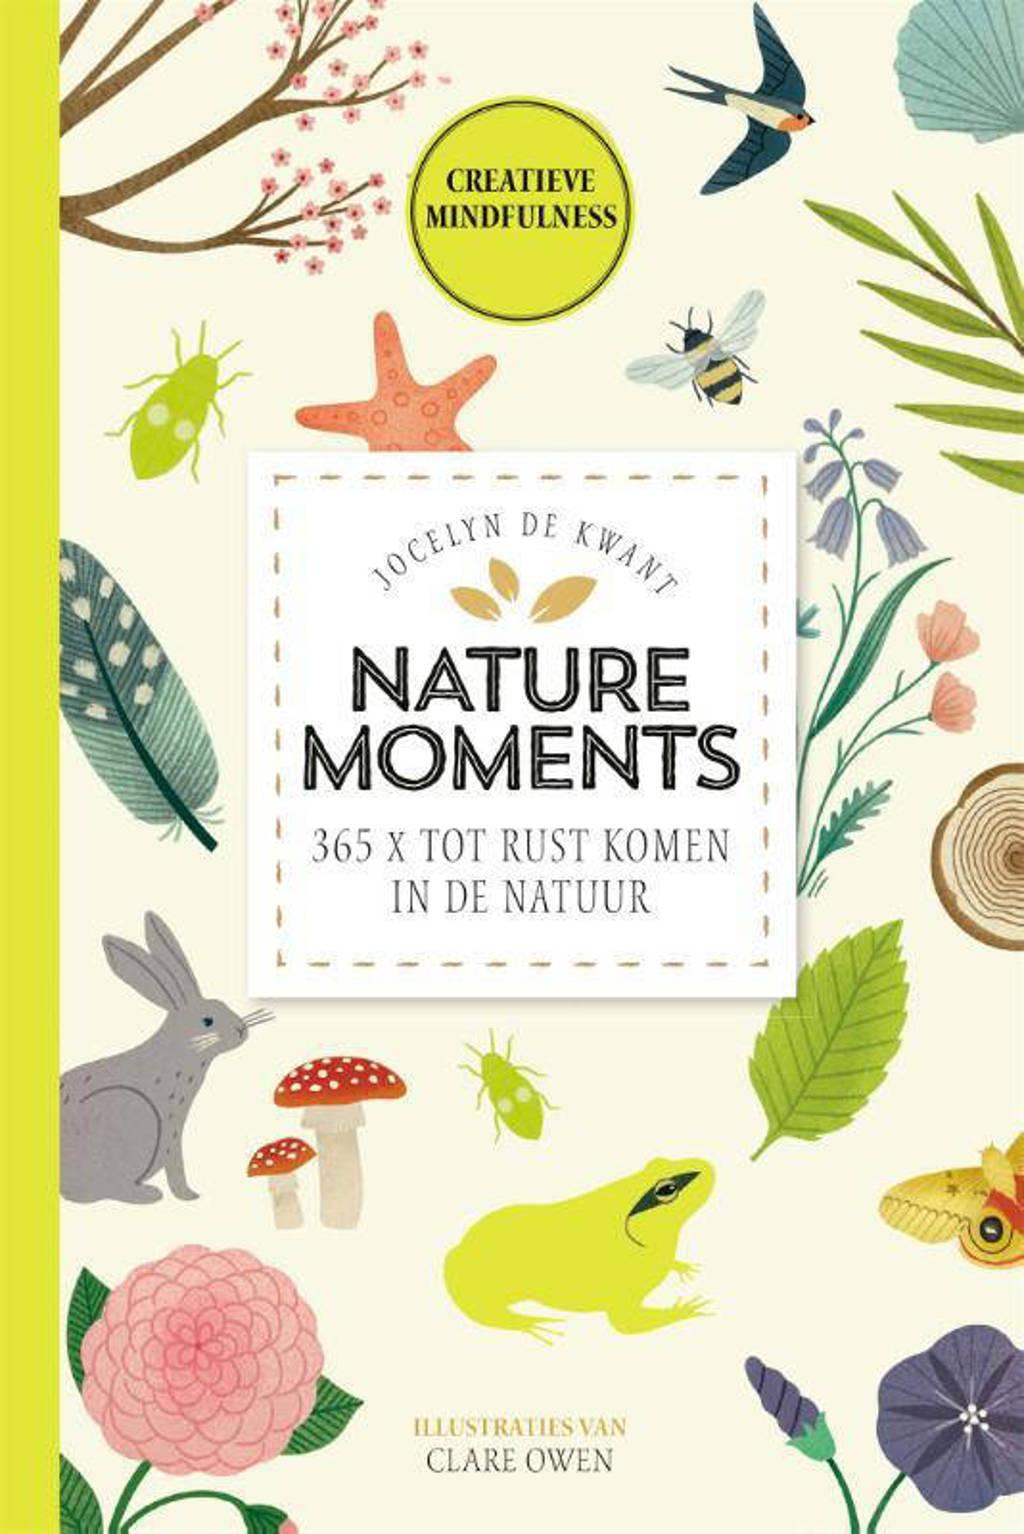 Nature moments - Jocelyn de Kwant